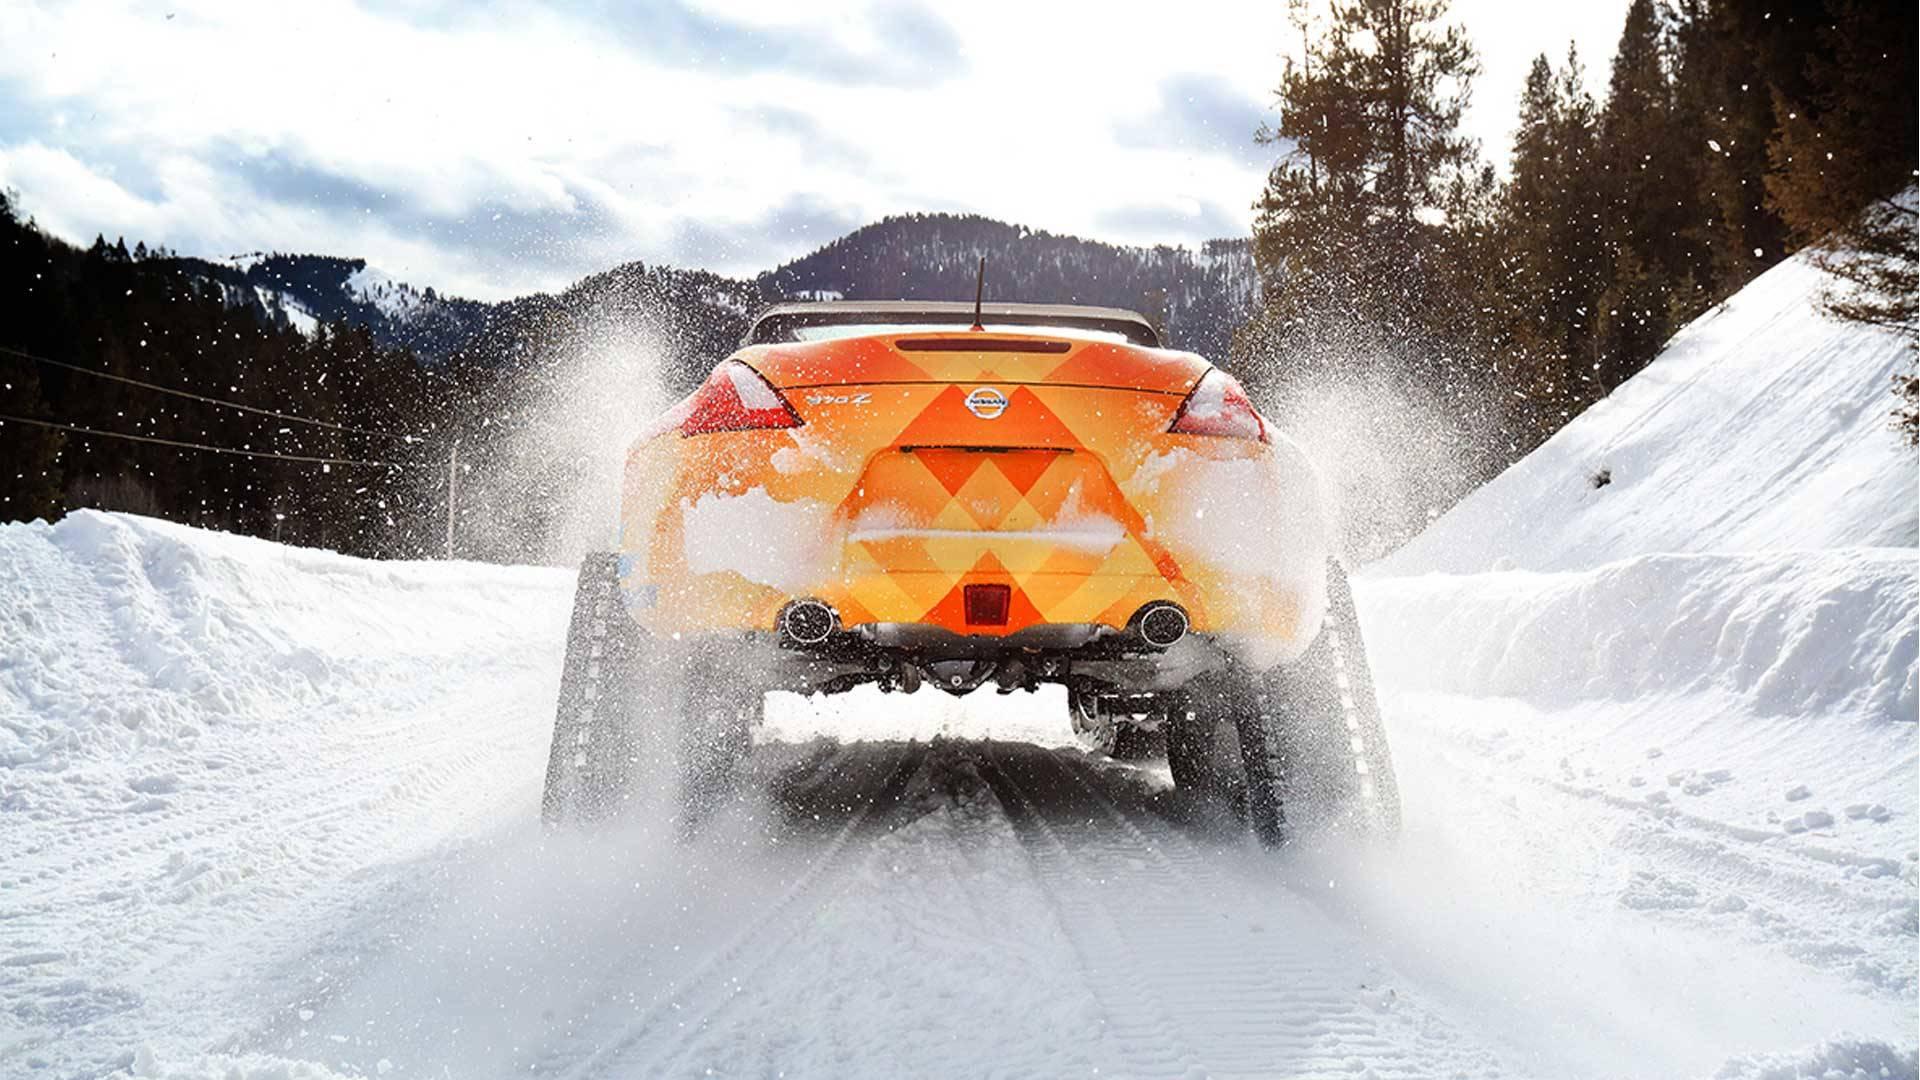 Nissan 370Zki Snowmobile